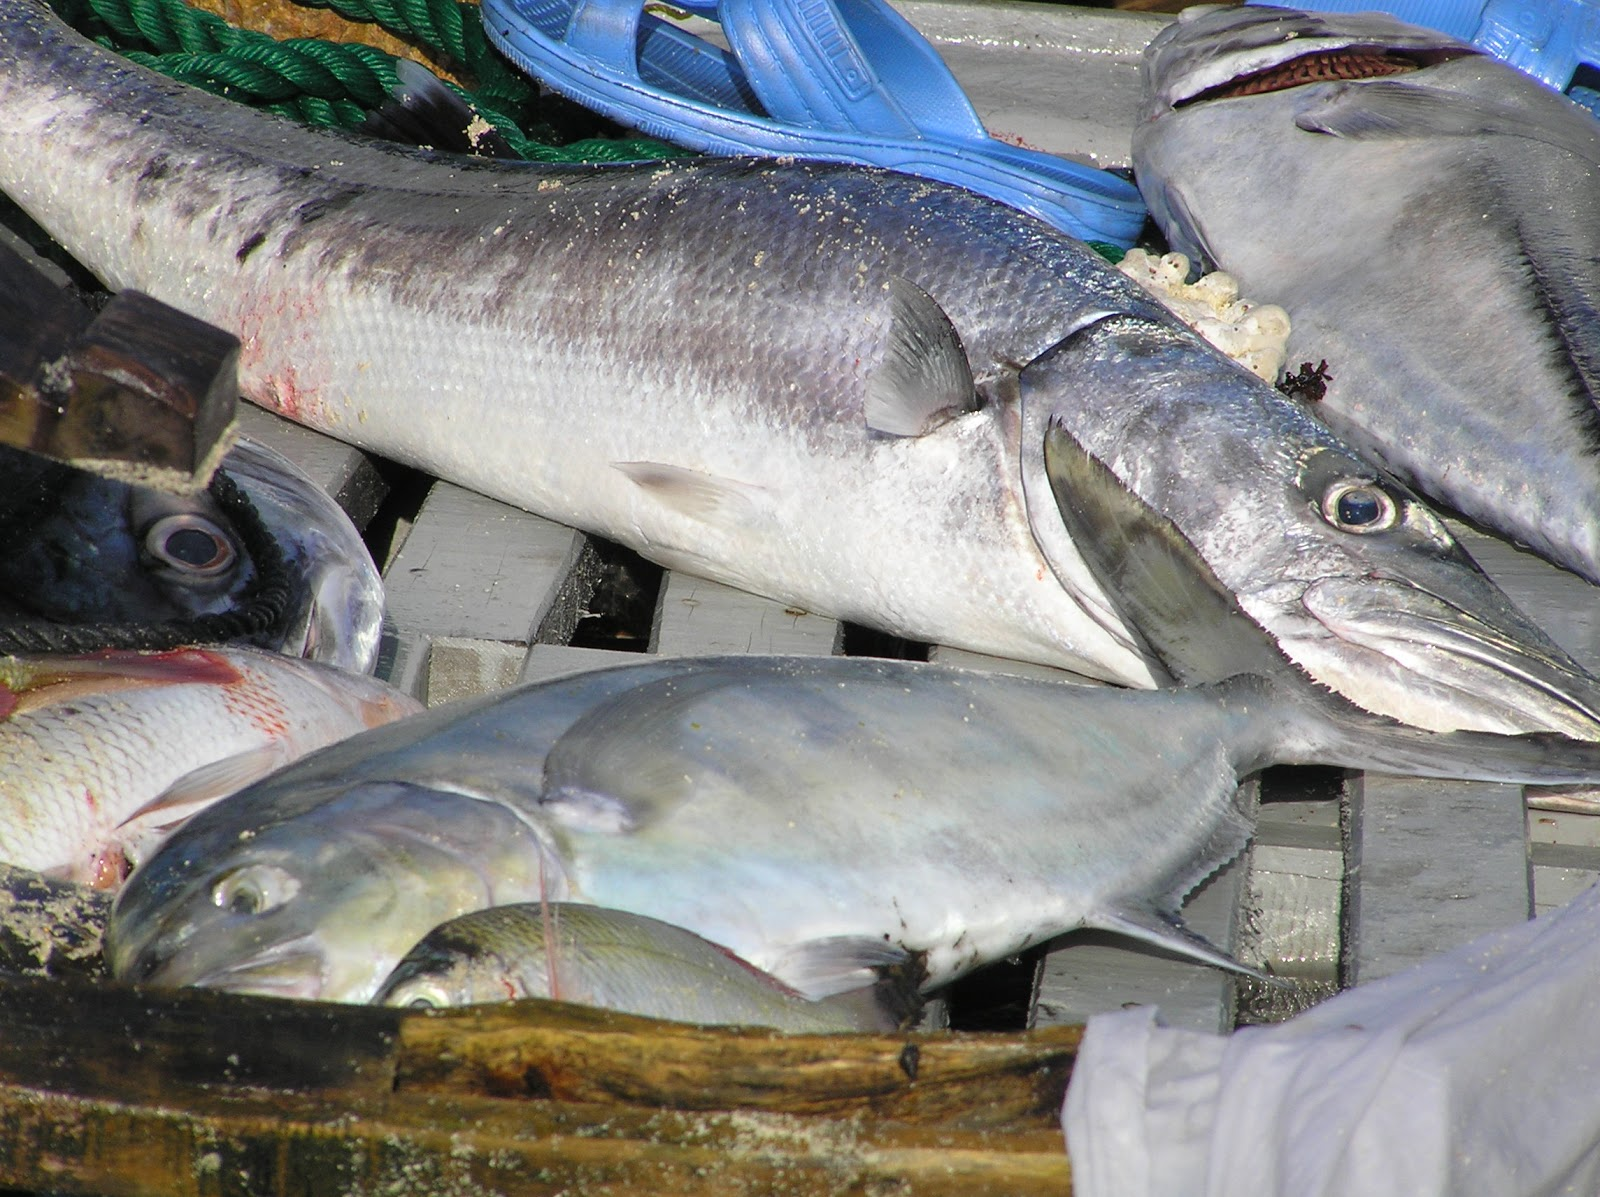 Freshwater fish of India - JungleKey.in Image